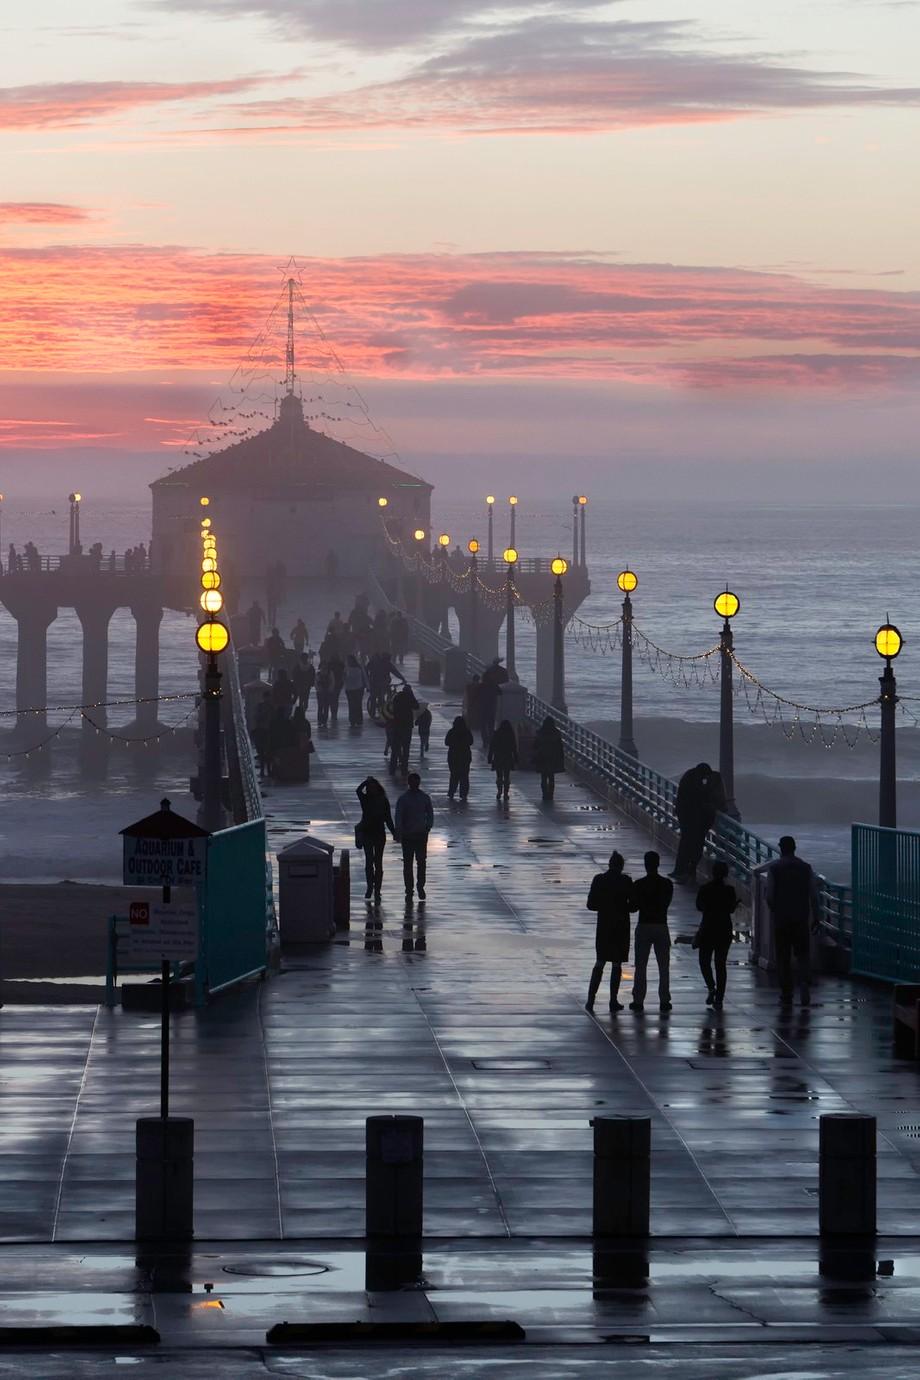 Pier La La by jrfleury - Promenades And Boardwalks Photo Contest